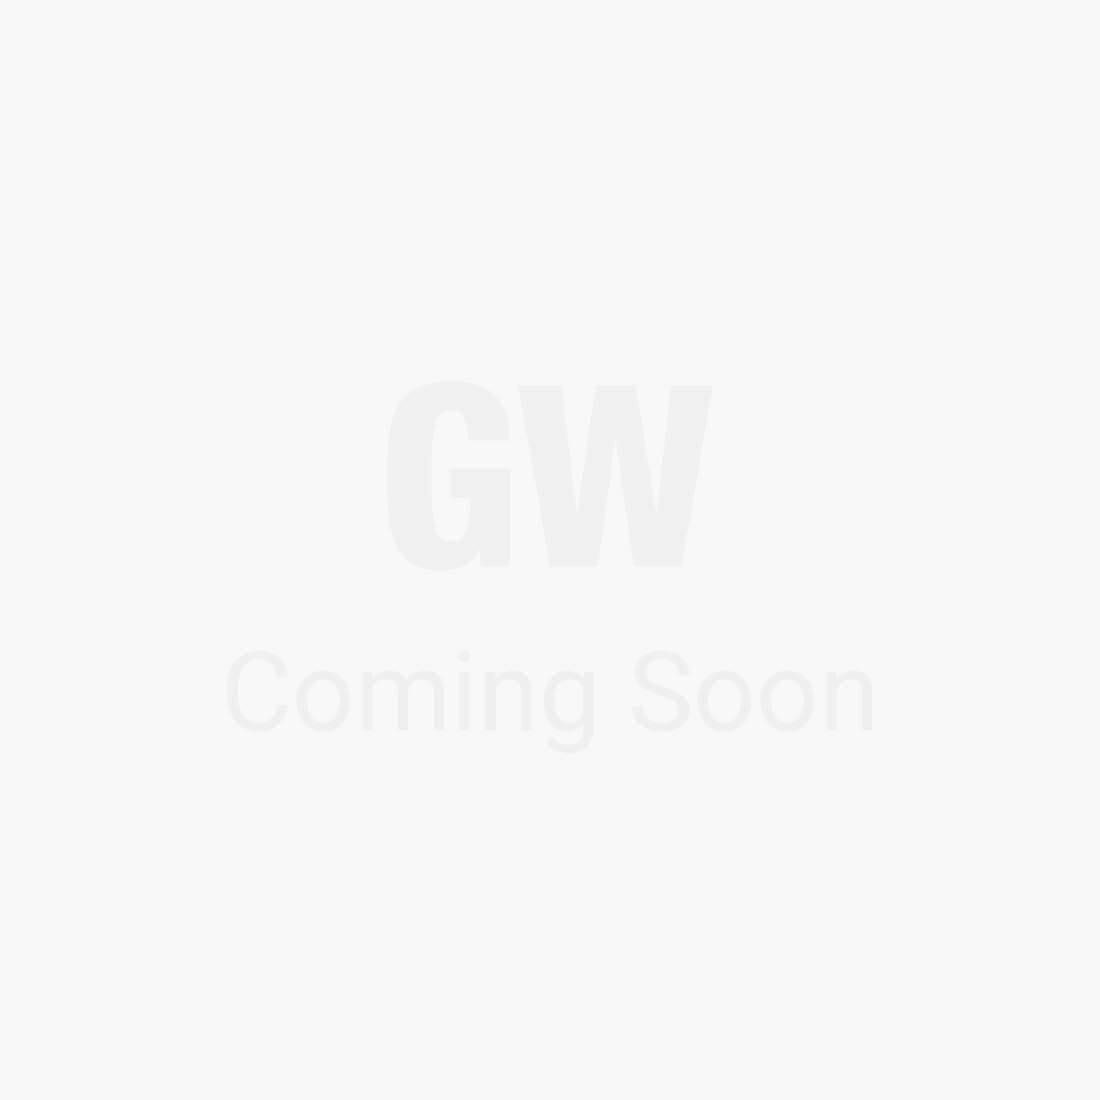 Peachy Baha Sofa Lounge Chair Globewest Frankydiablos Diy Chair Ideas Frankydiabloscom